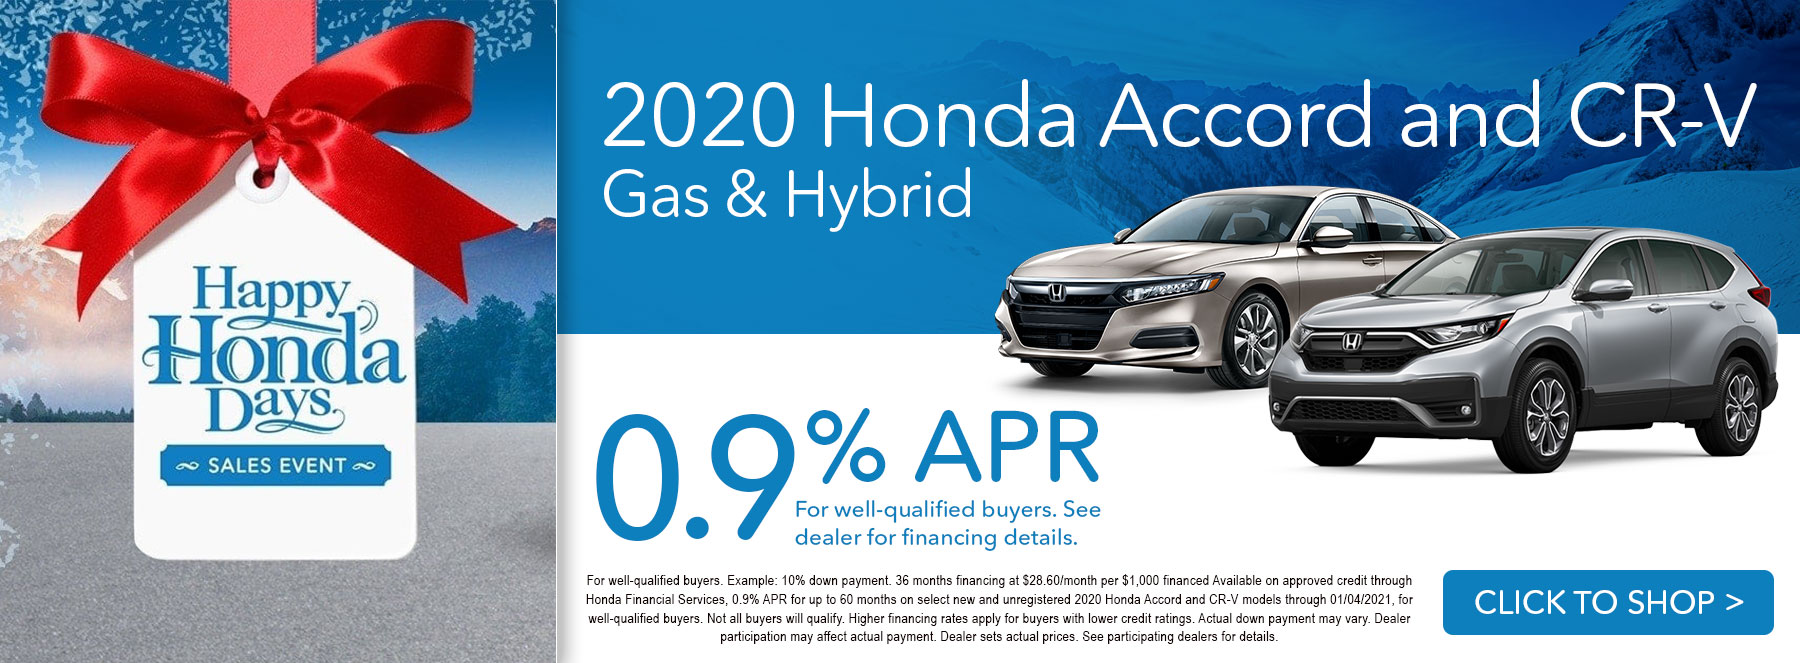 2020 Honda Accord and CR-V - 0.9% APR